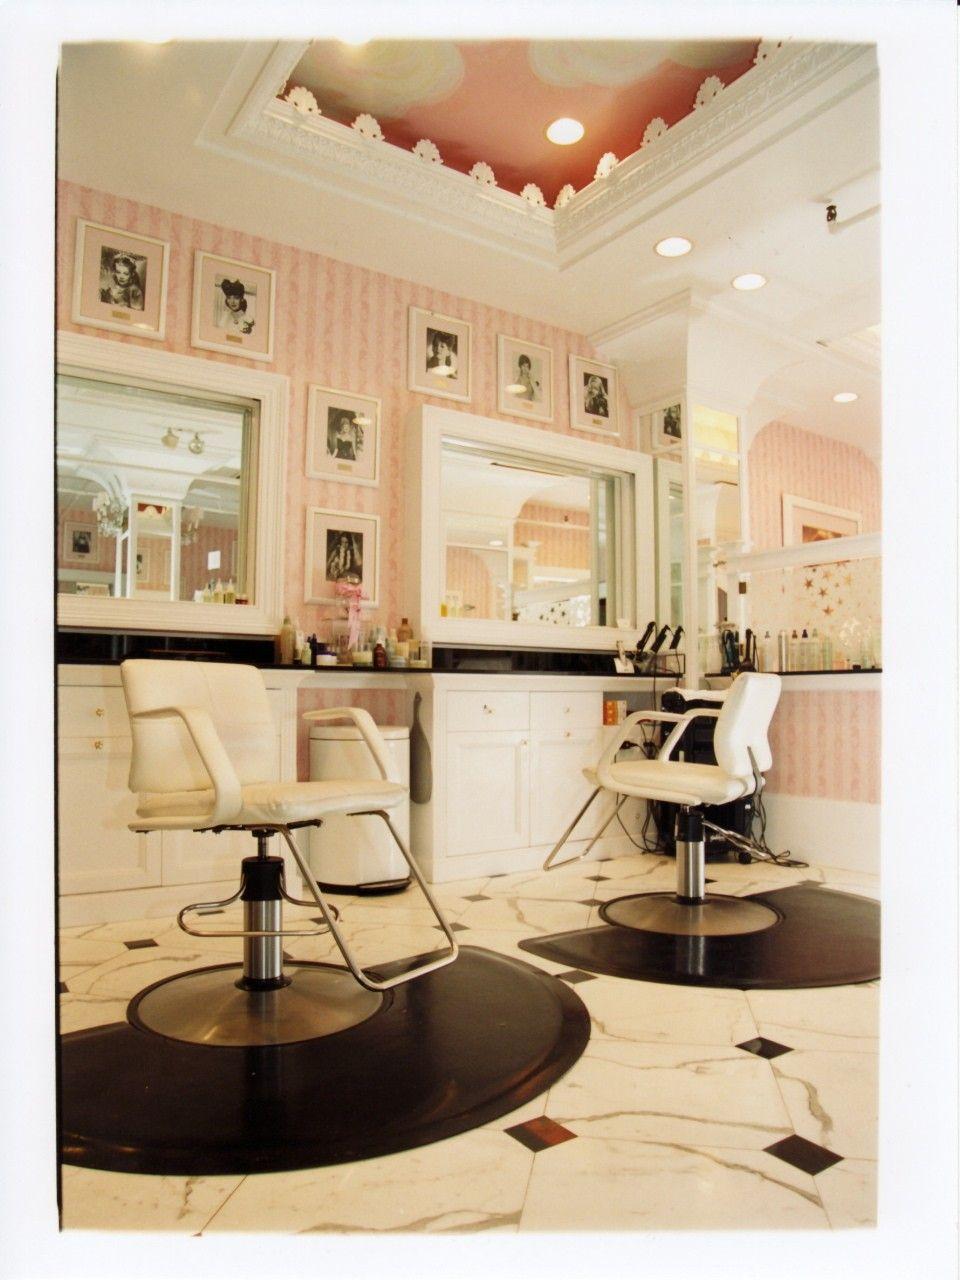 Astor's Spa, Grand Hotel, Mackinac Island, MI. I'd Have To